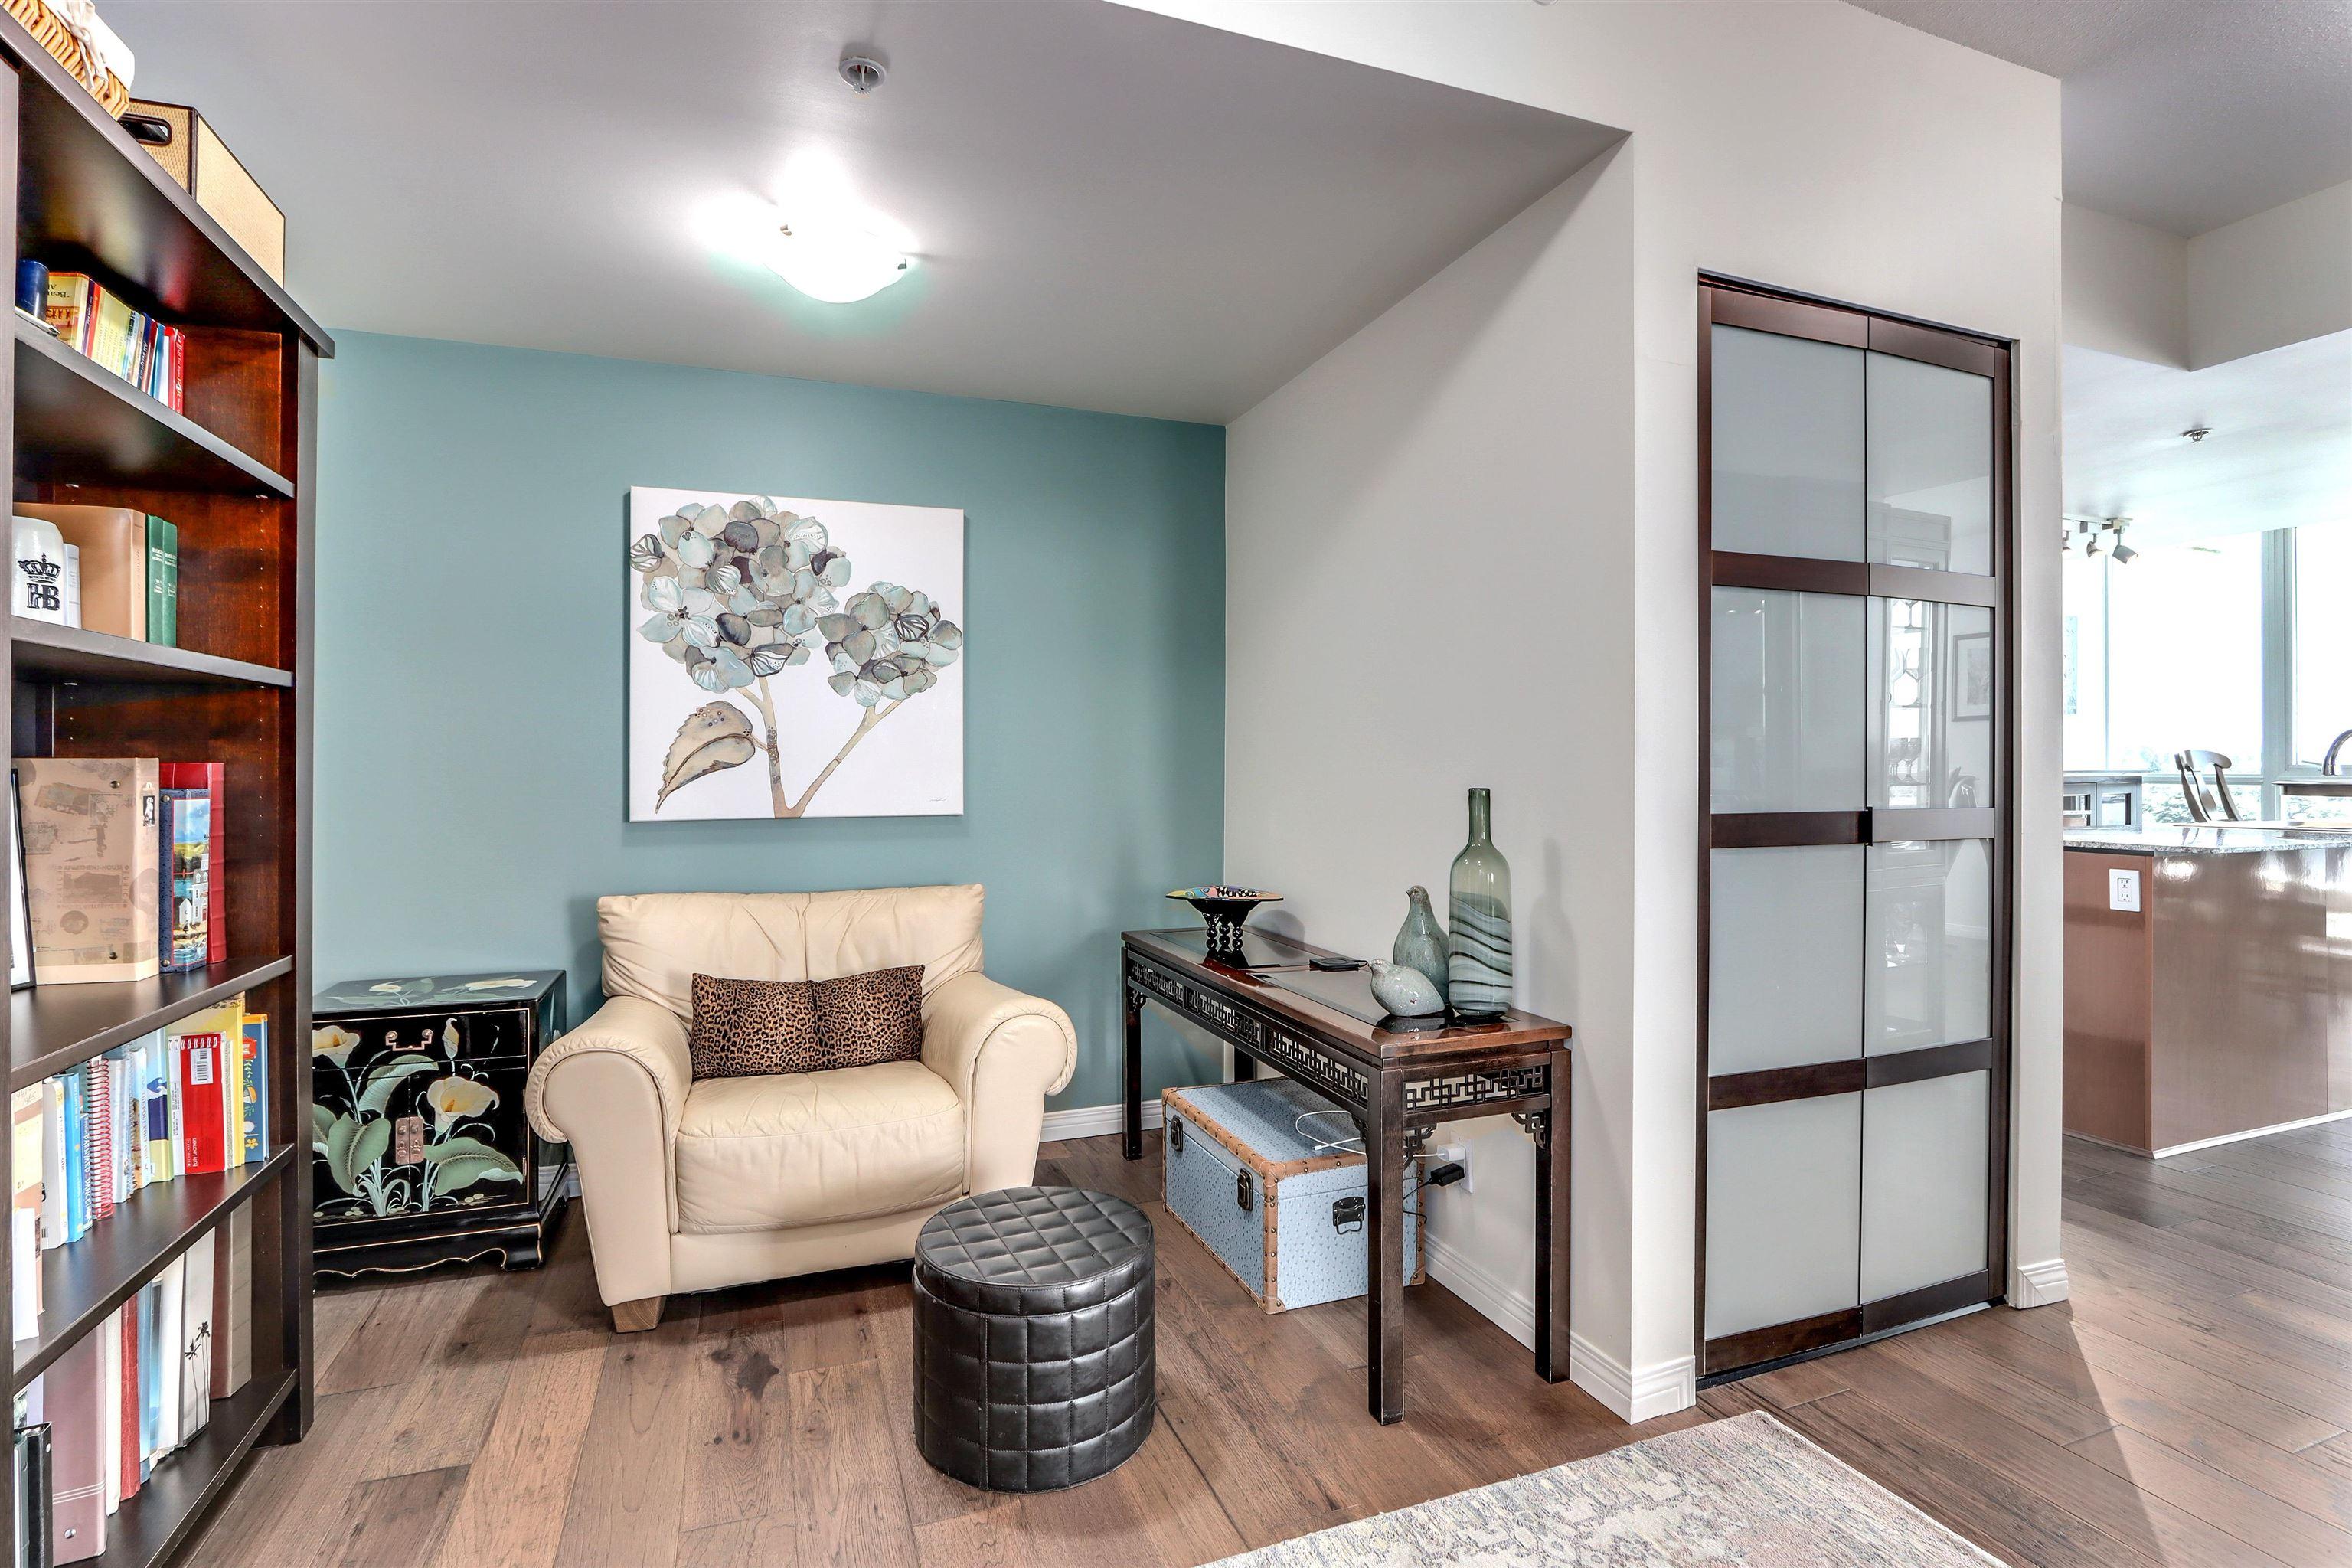 2202 188 E ESPLANADE - Lower Lonsdale Apartment/Condo for sale, 2 Bedrooms (R2618412) - #18